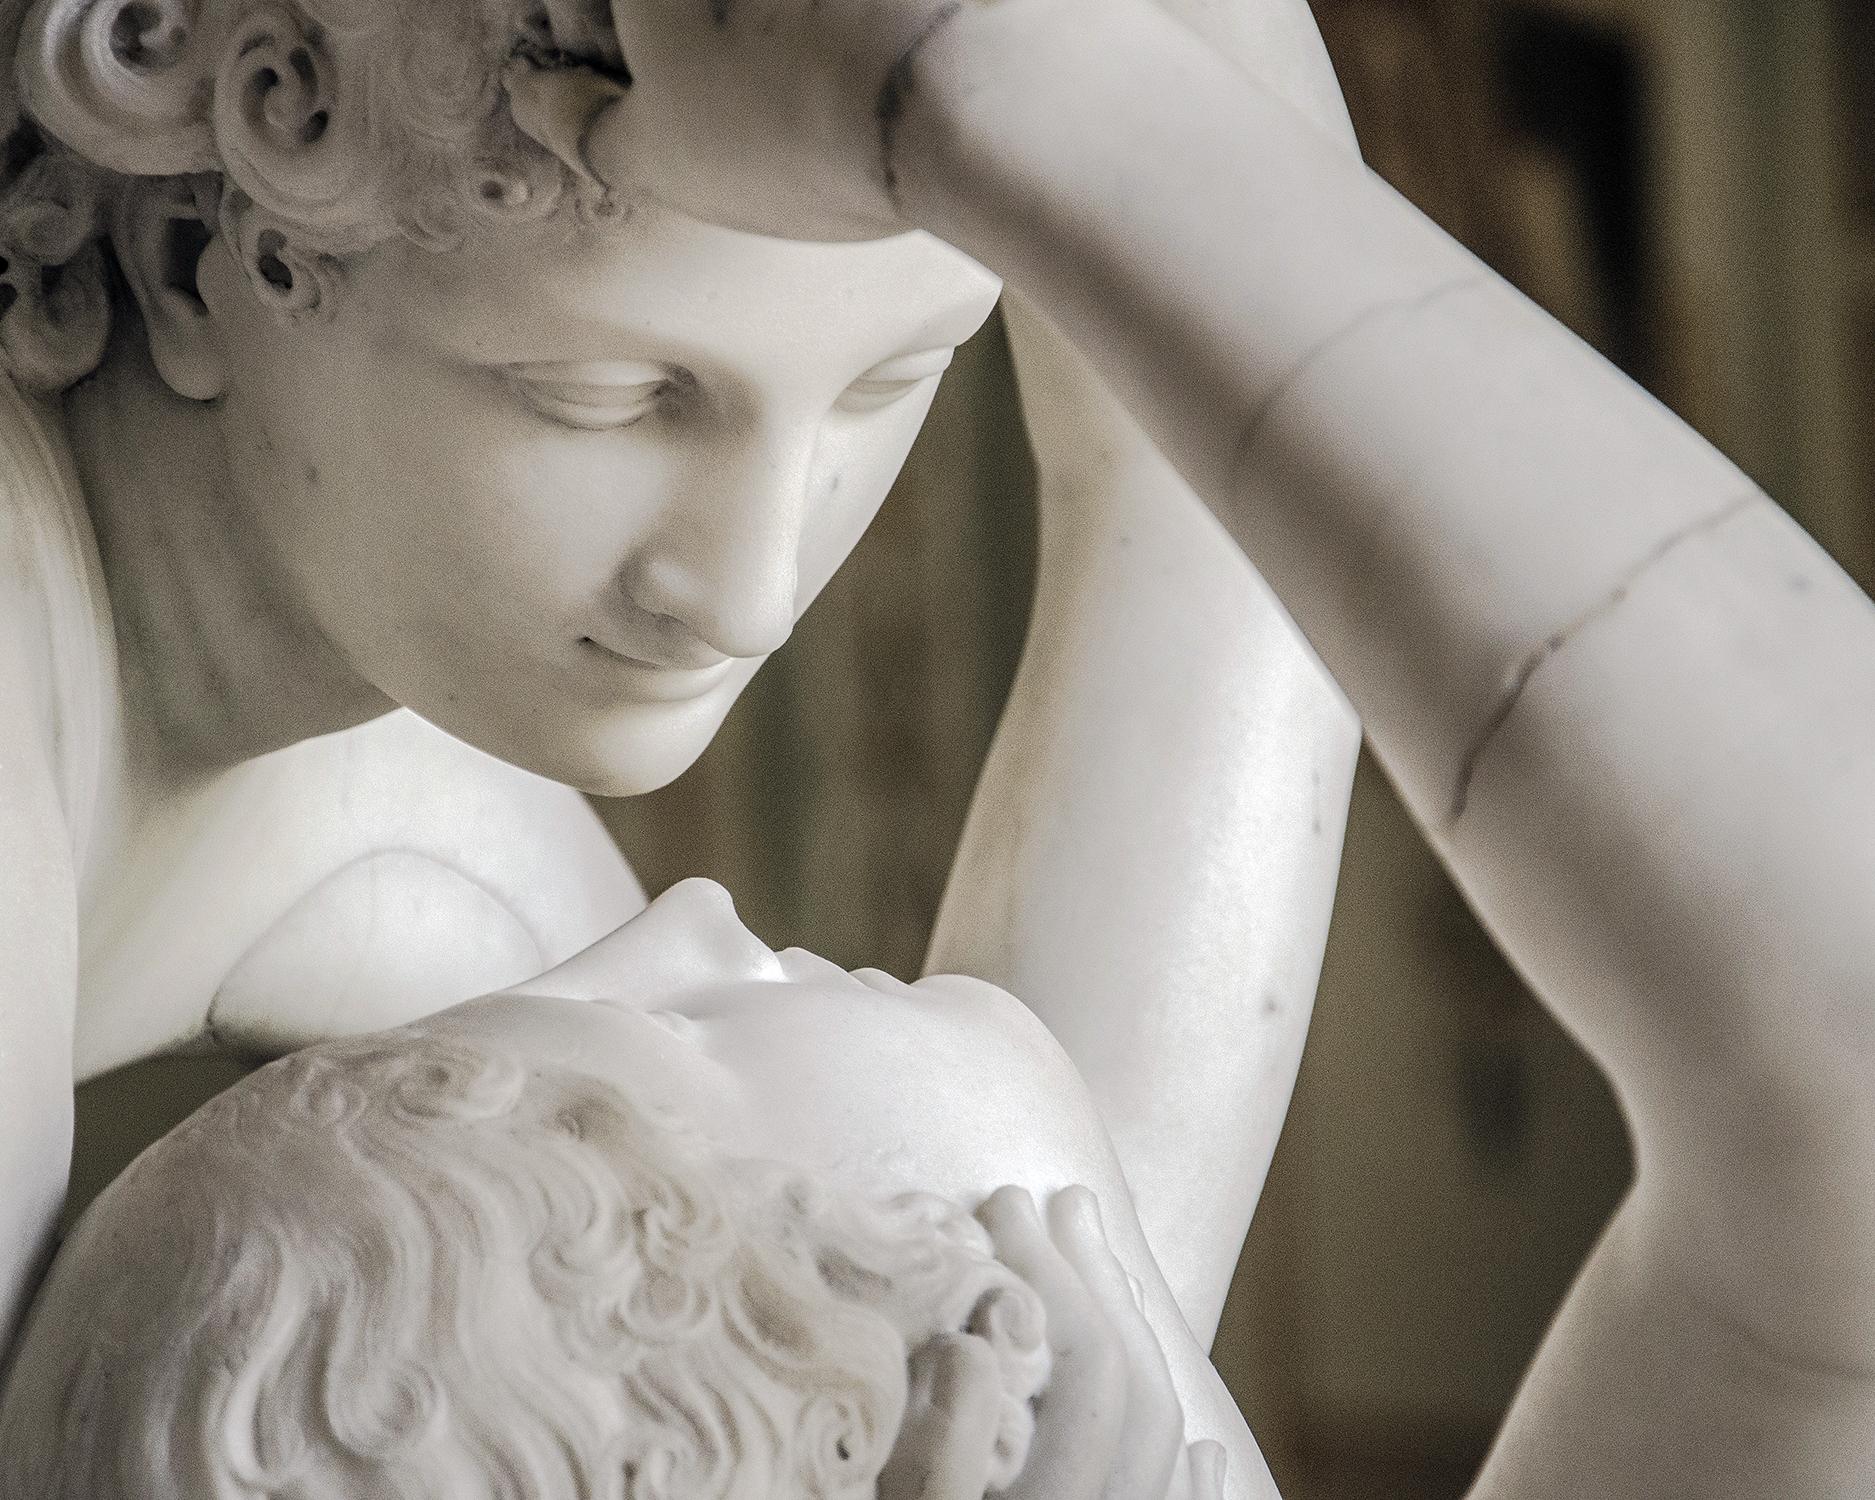 Amore e Psiche-Canova-Ermitage-S. Pietroburgo-8452.jpg